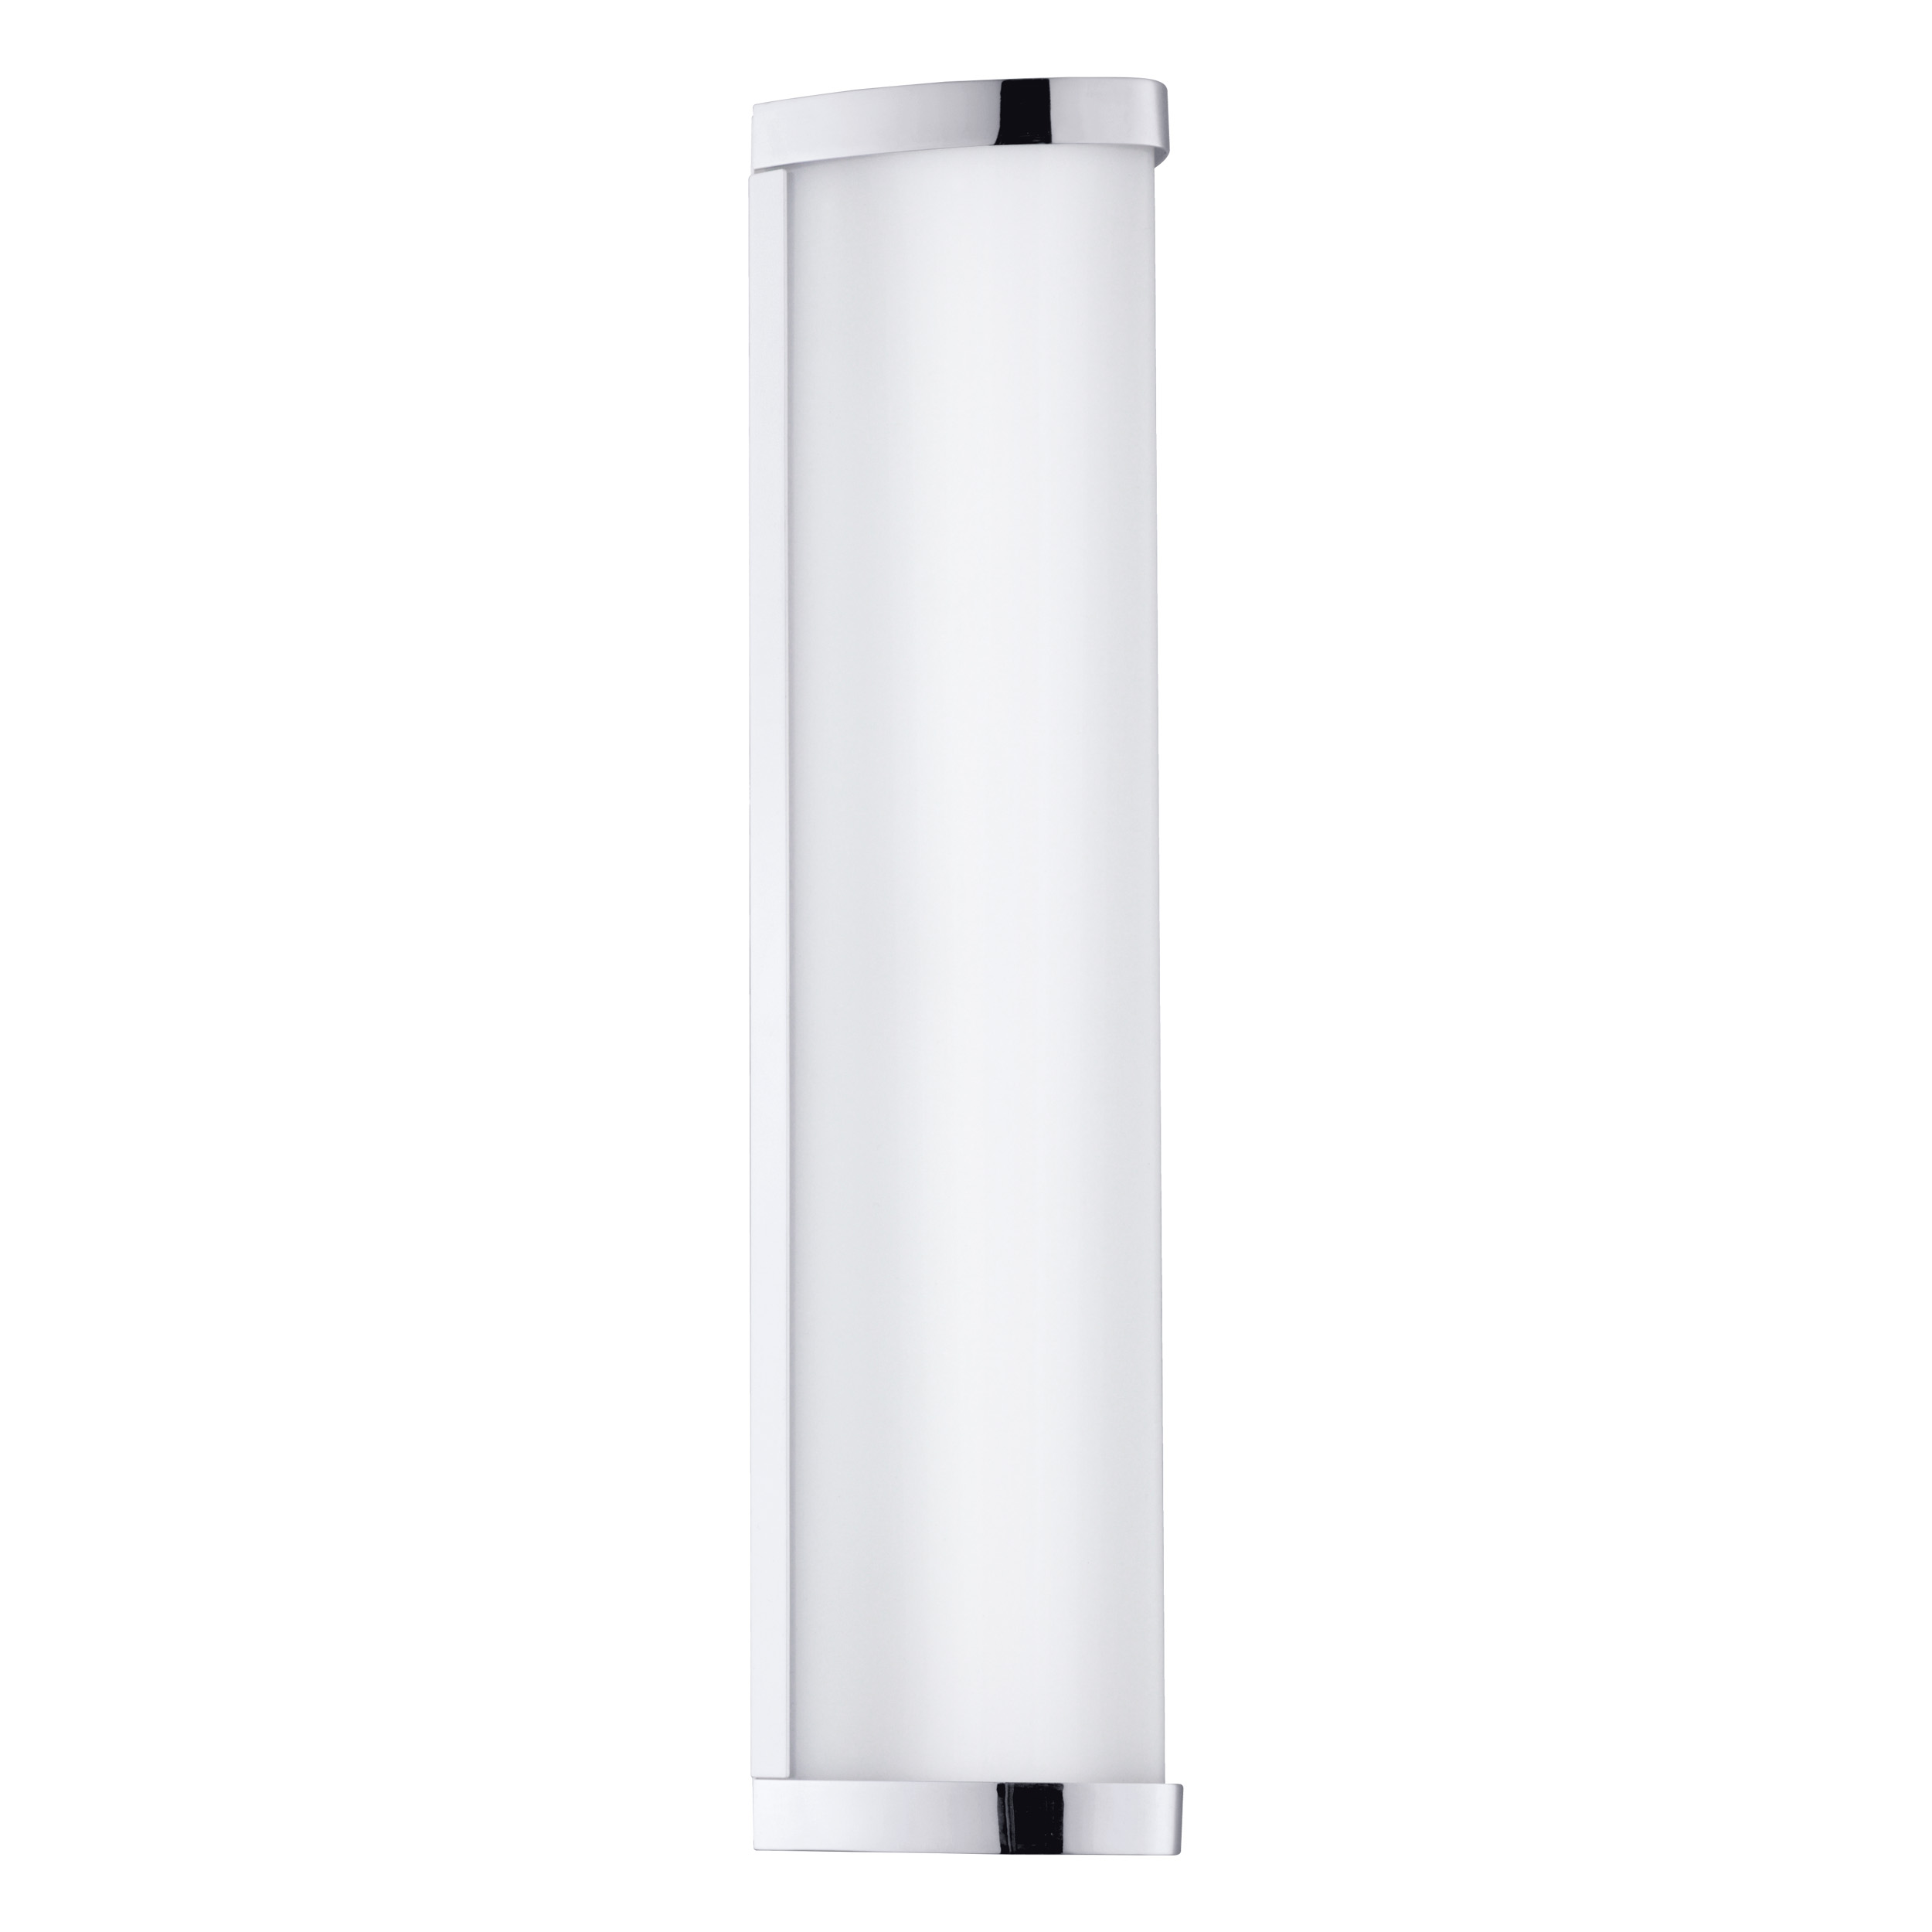 1 Stk LED-Wandleuchte Gita 2 Pro 8,3W 3000K chrom/weiss IP20 LI64047---